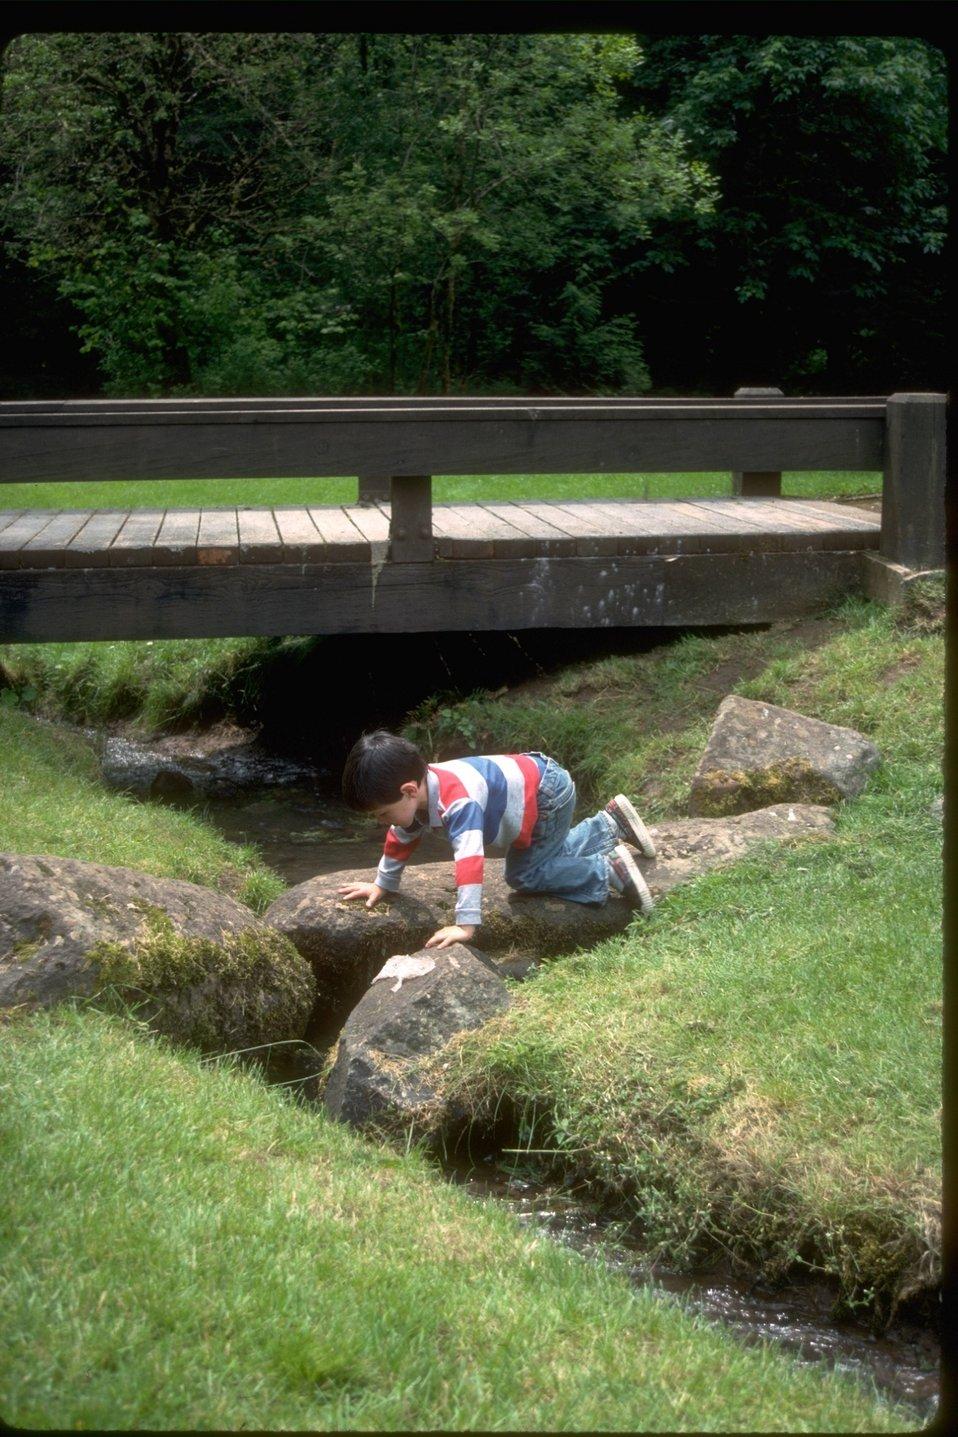 Child explores Shotgun Park along bank of brook.